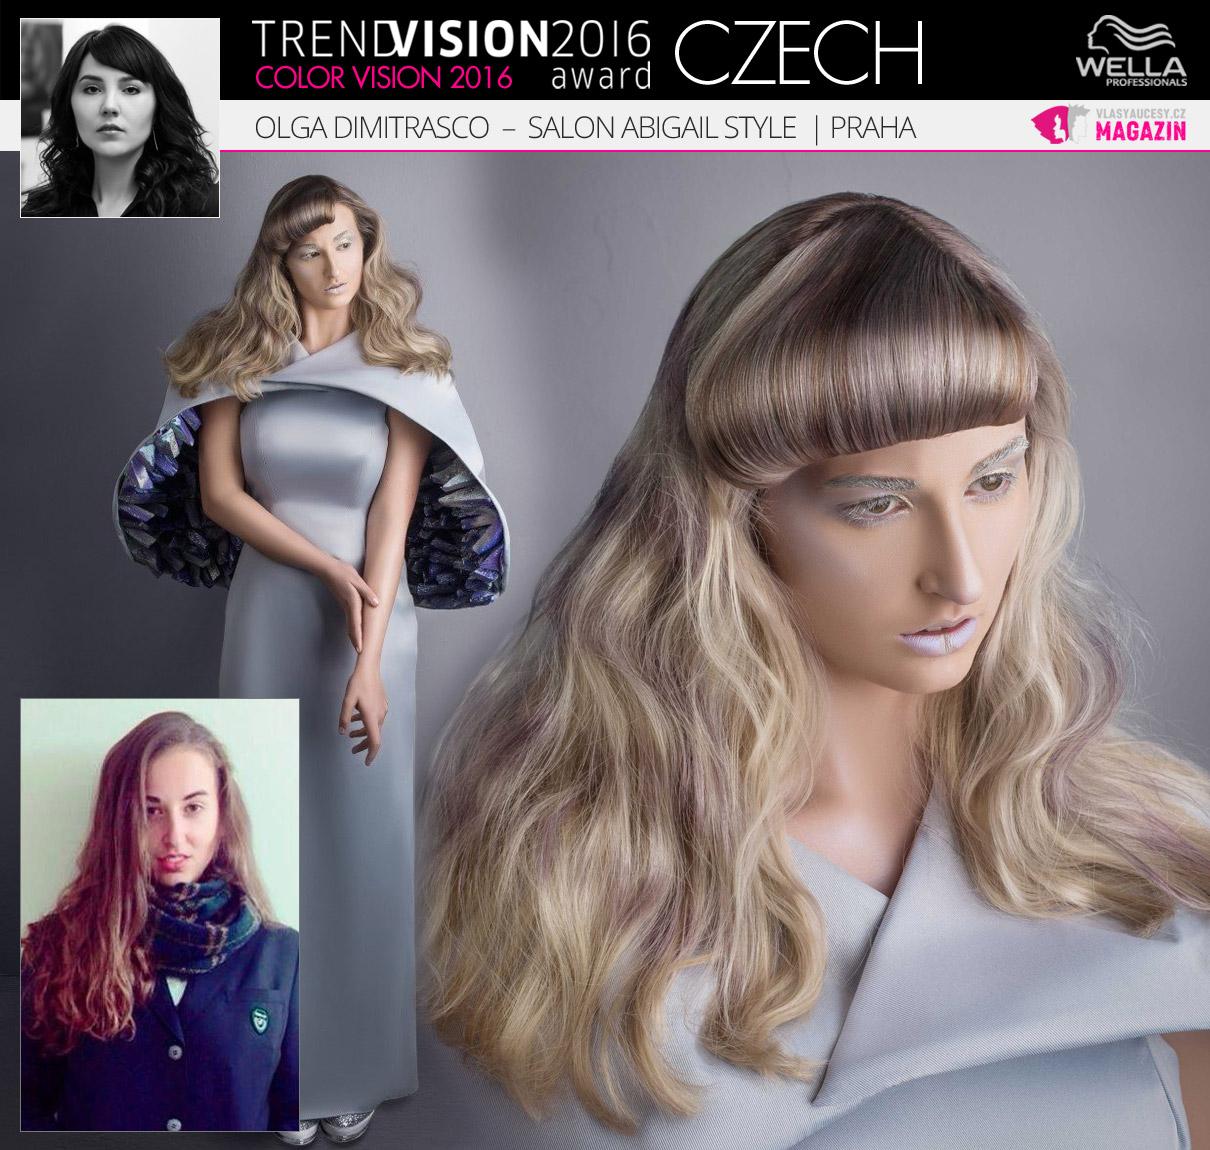 Olga Dimitrasco, Salon Abigail Style, Praha –Wella Professionals Trend Vision Award Česká republika, kategorie Color Vision 2016.